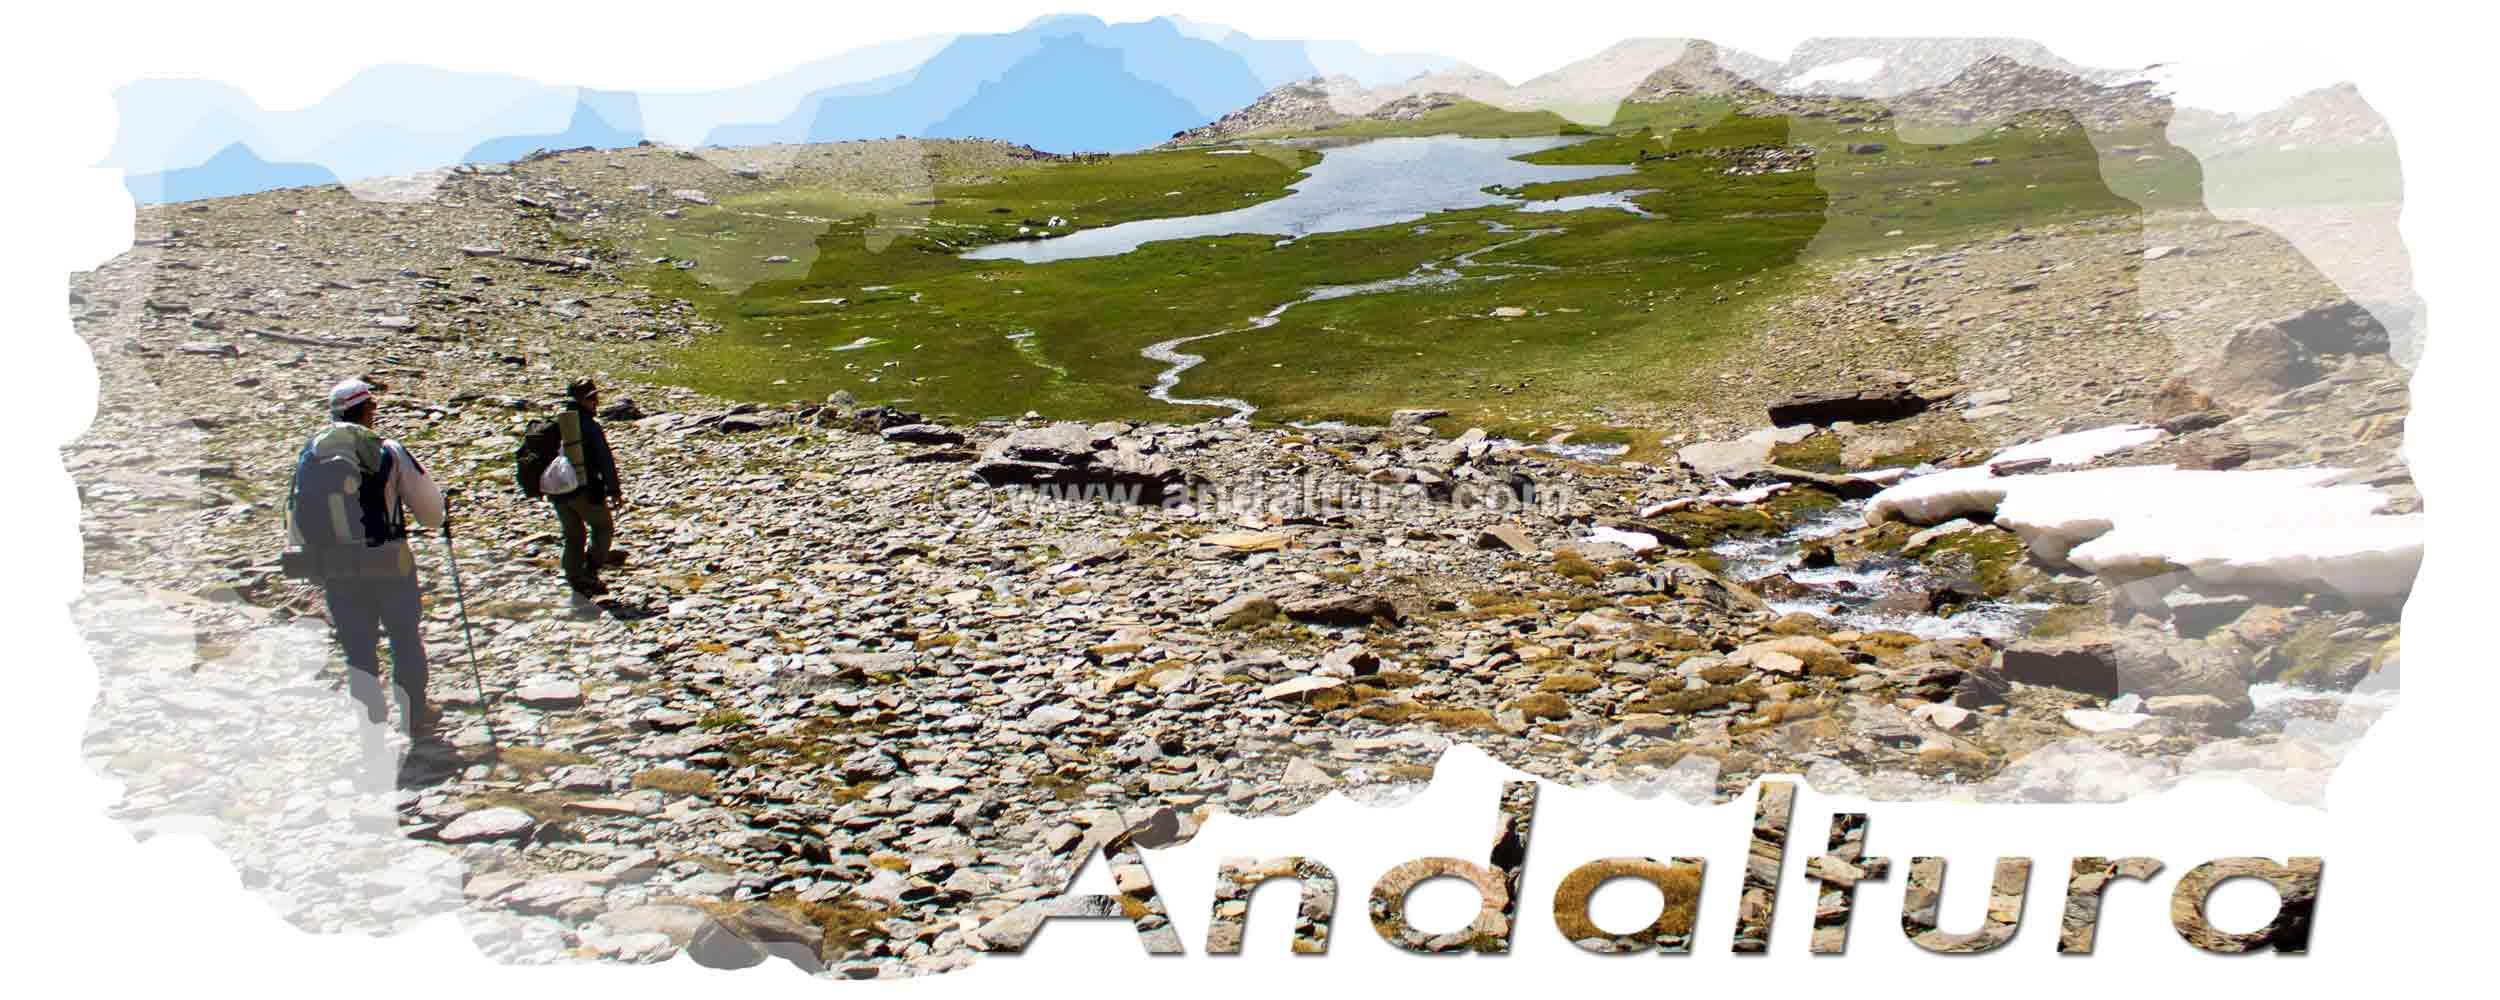 Cabecera Rutas de Senderismo por Andalucía Andaltura - 7 Lagunas -